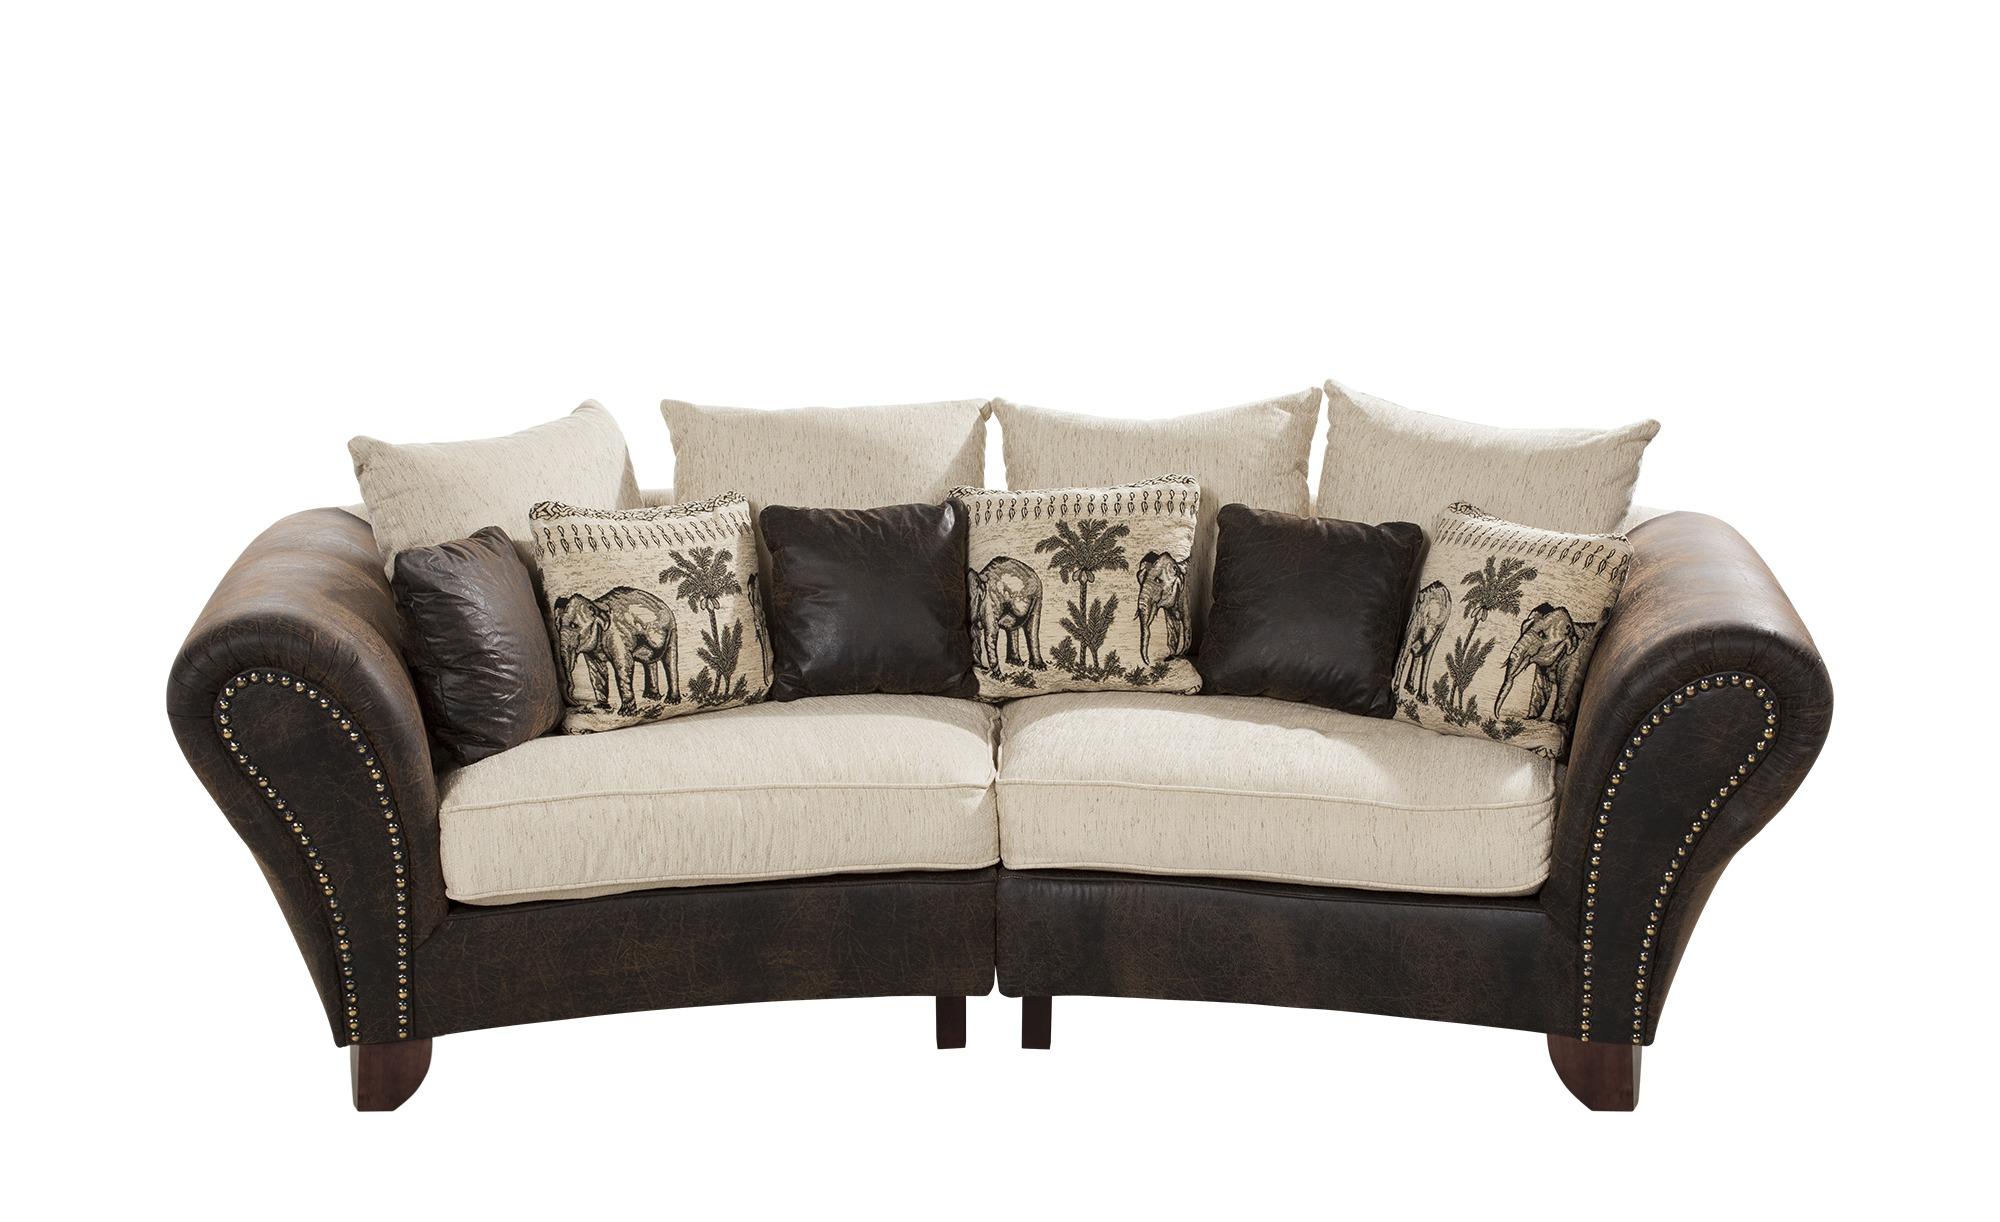 smart Big Sofa braun/beige - Mikrofaser/Webstoff Nadja